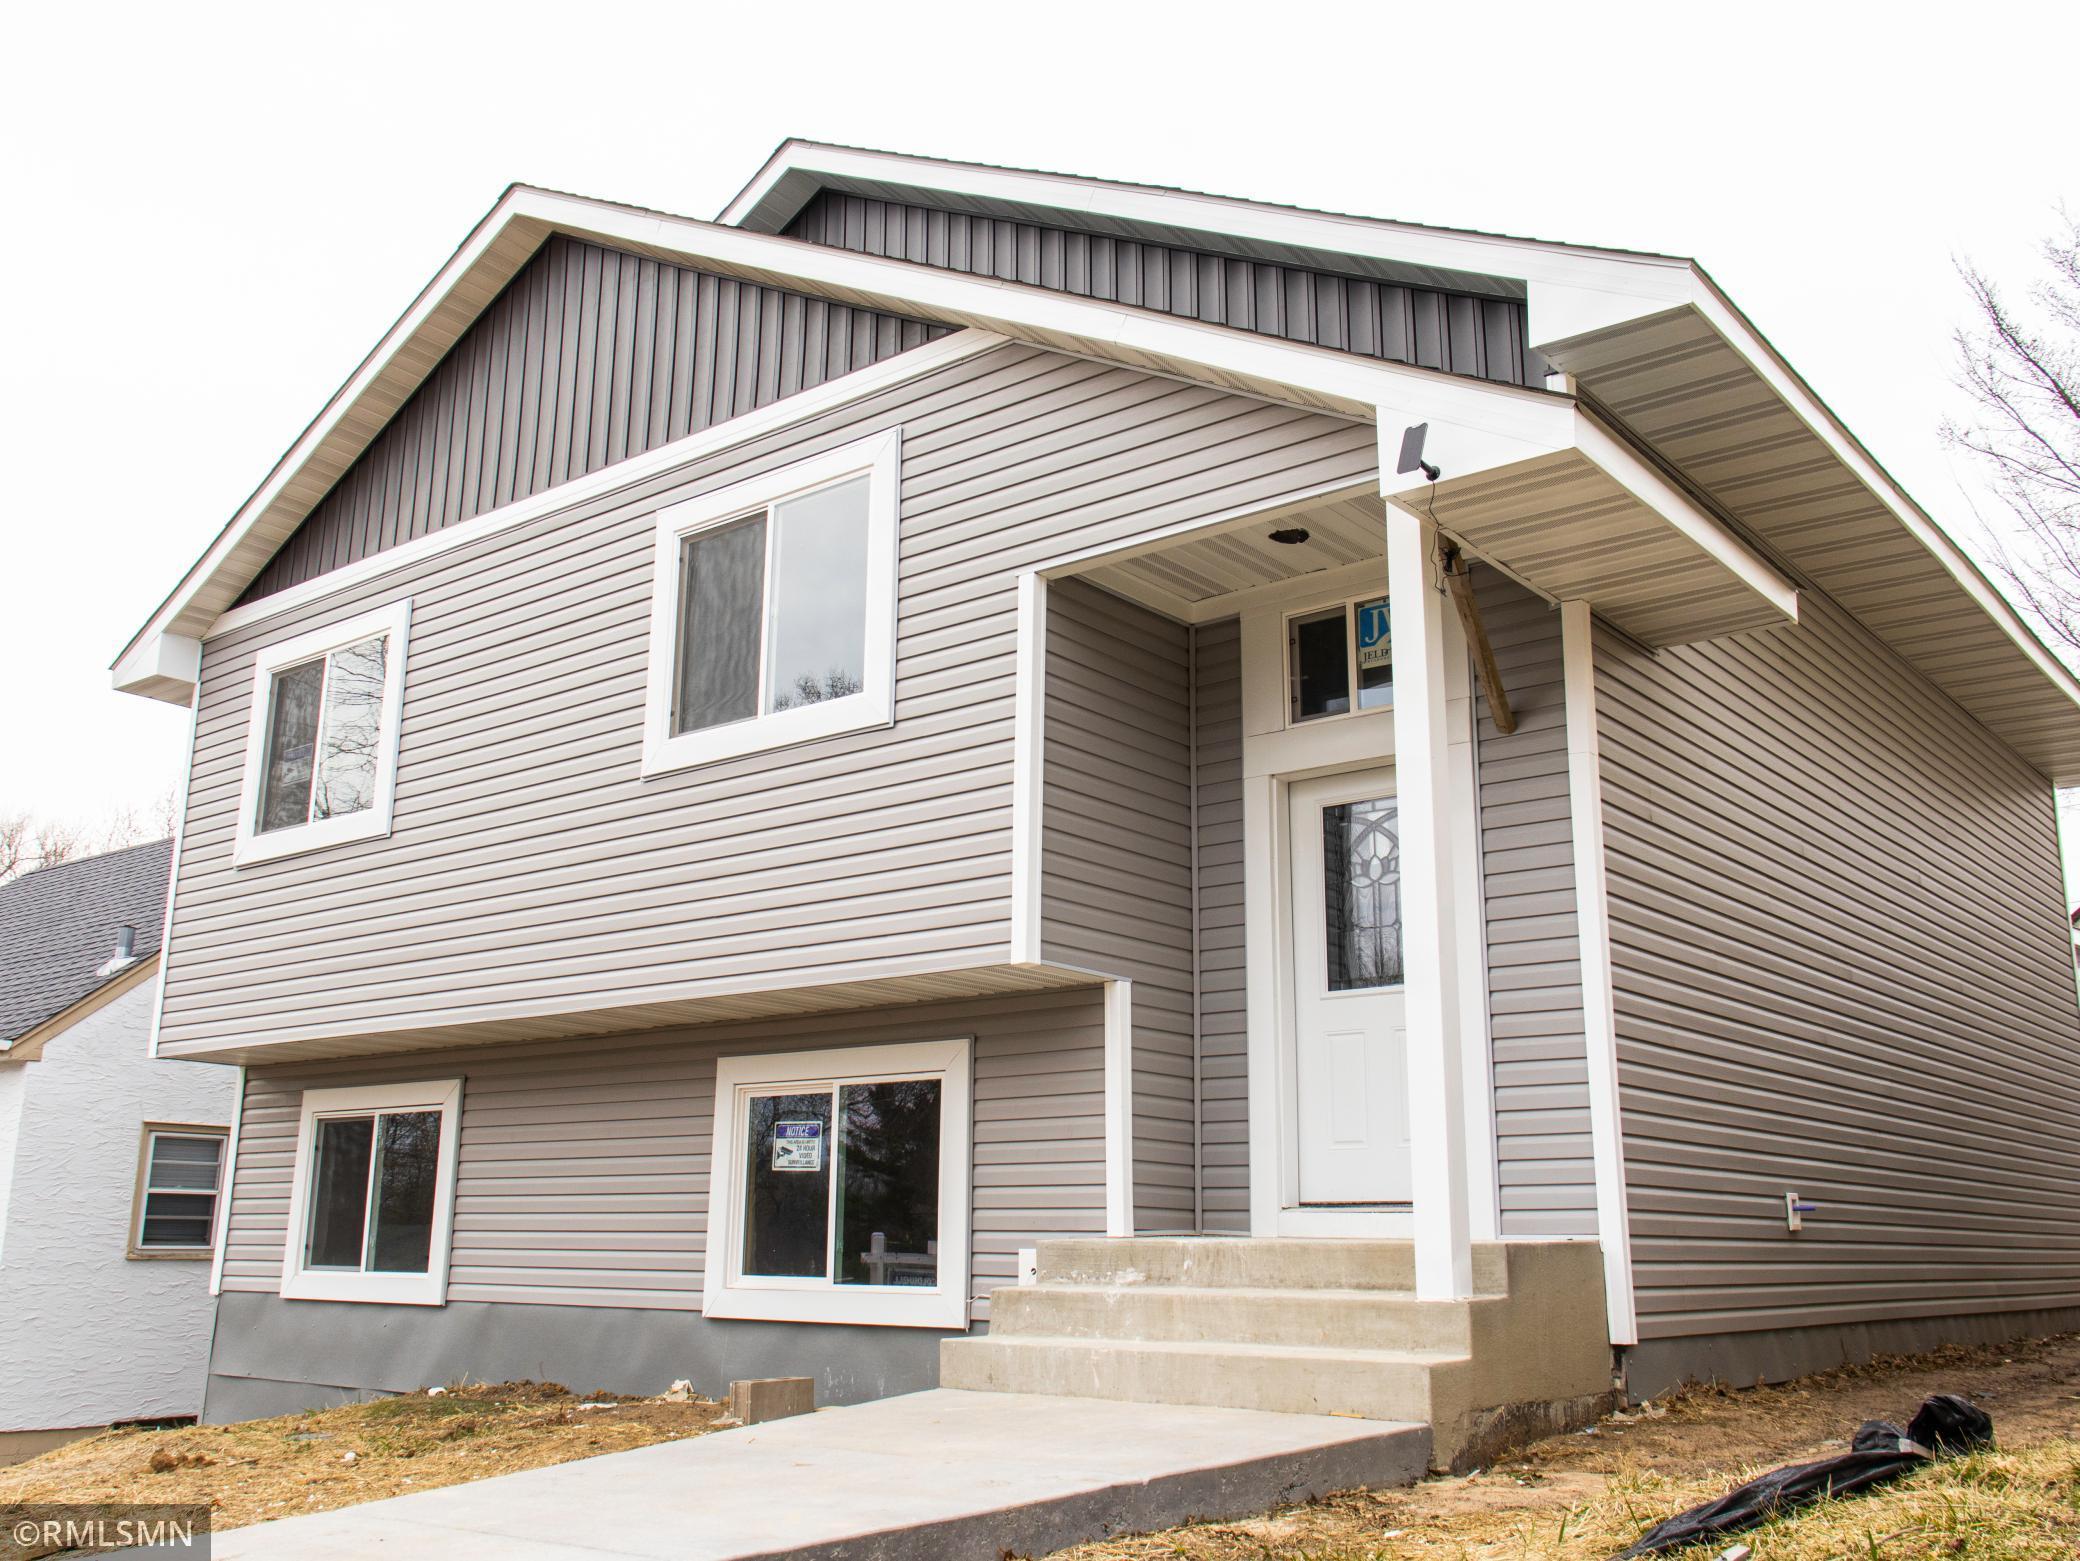 1681 Reaney Avenue, Saint Paul, Minnesota 55106, 4 Bedrooms Bedrooms, ,2 BathroomsBathrooms,Residential,For Sale,Reaney,NST5730477